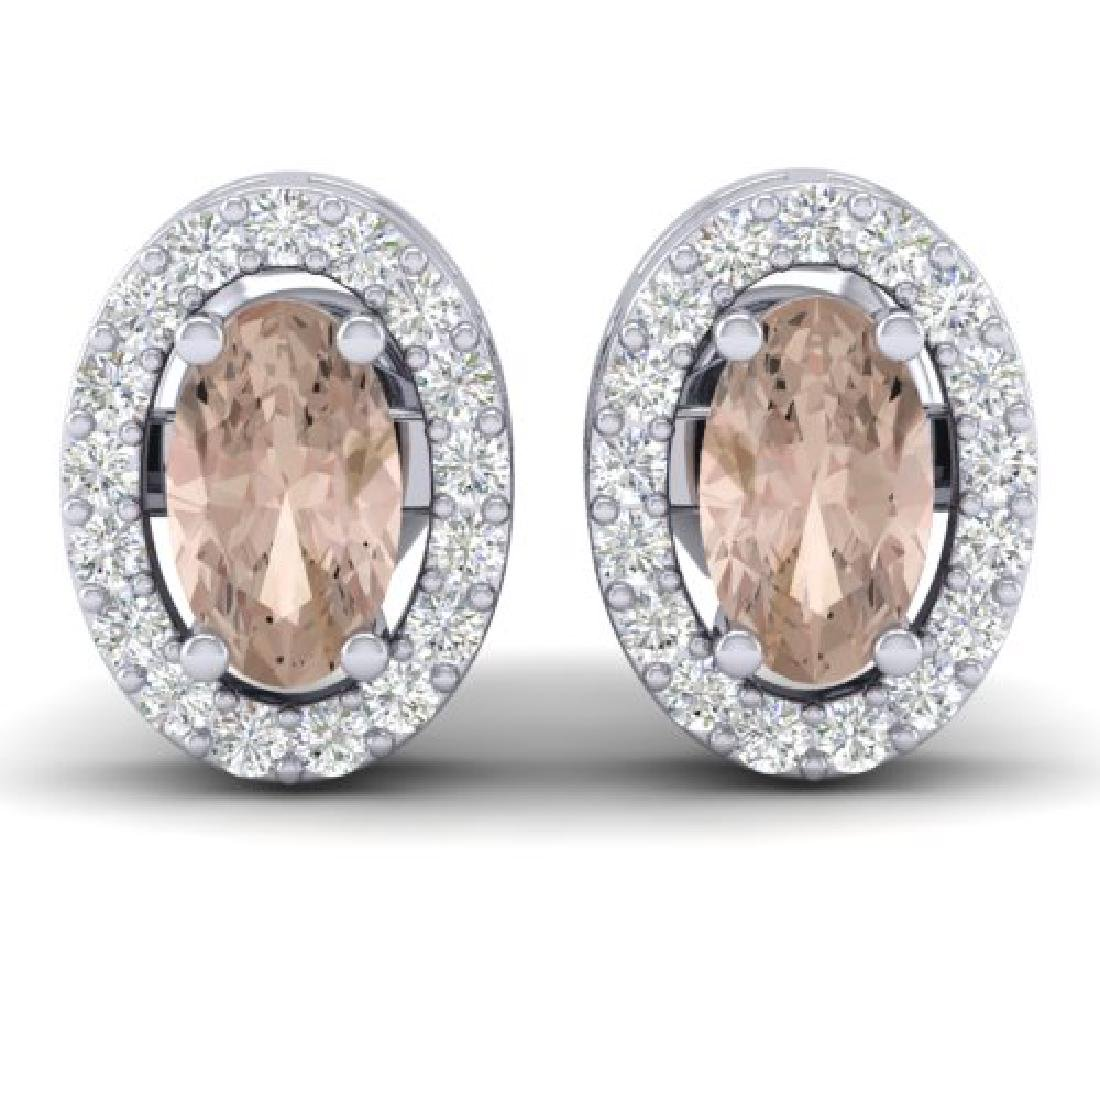 0.75 CTW Morganite & Micro Pave VS/SI Diamond Earrings